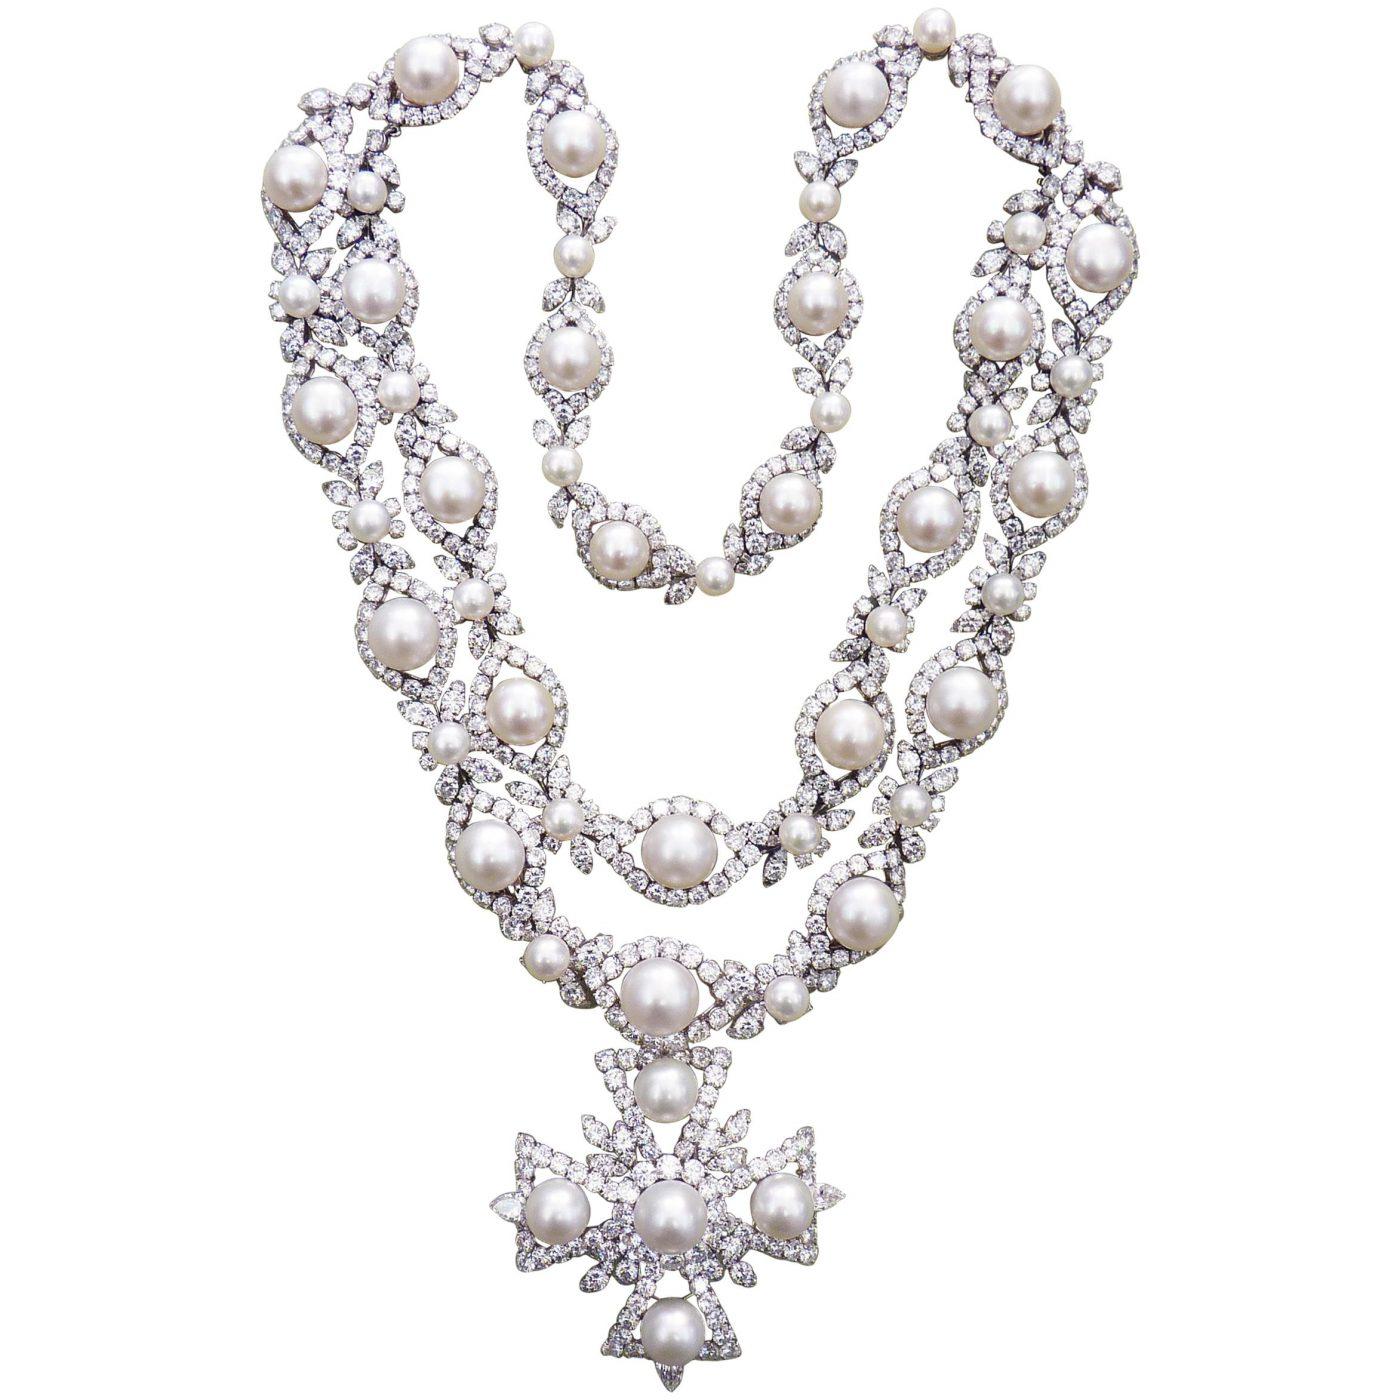 Van Cleef & Arpels Diamond Pearl Cross Necklace in Platinum